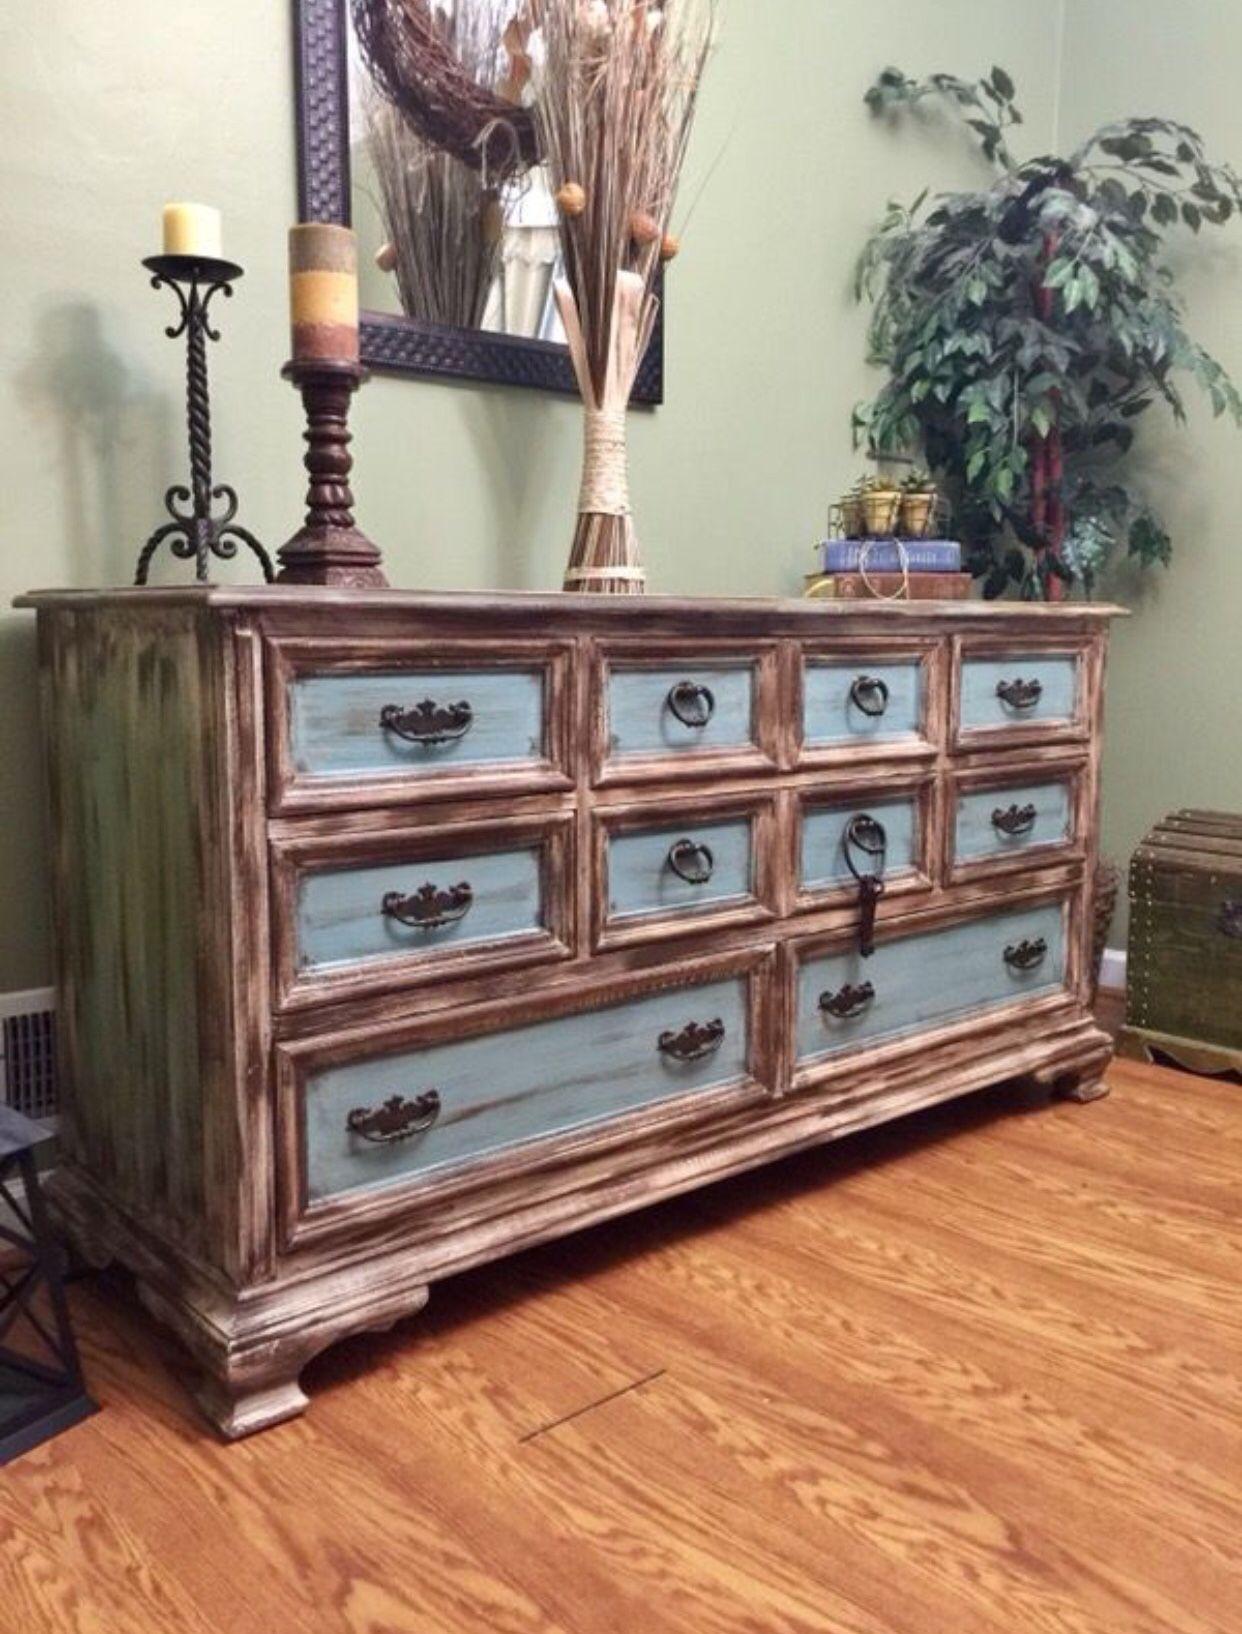 Distressed Dresser with blue, beige, brown | Distressed ...